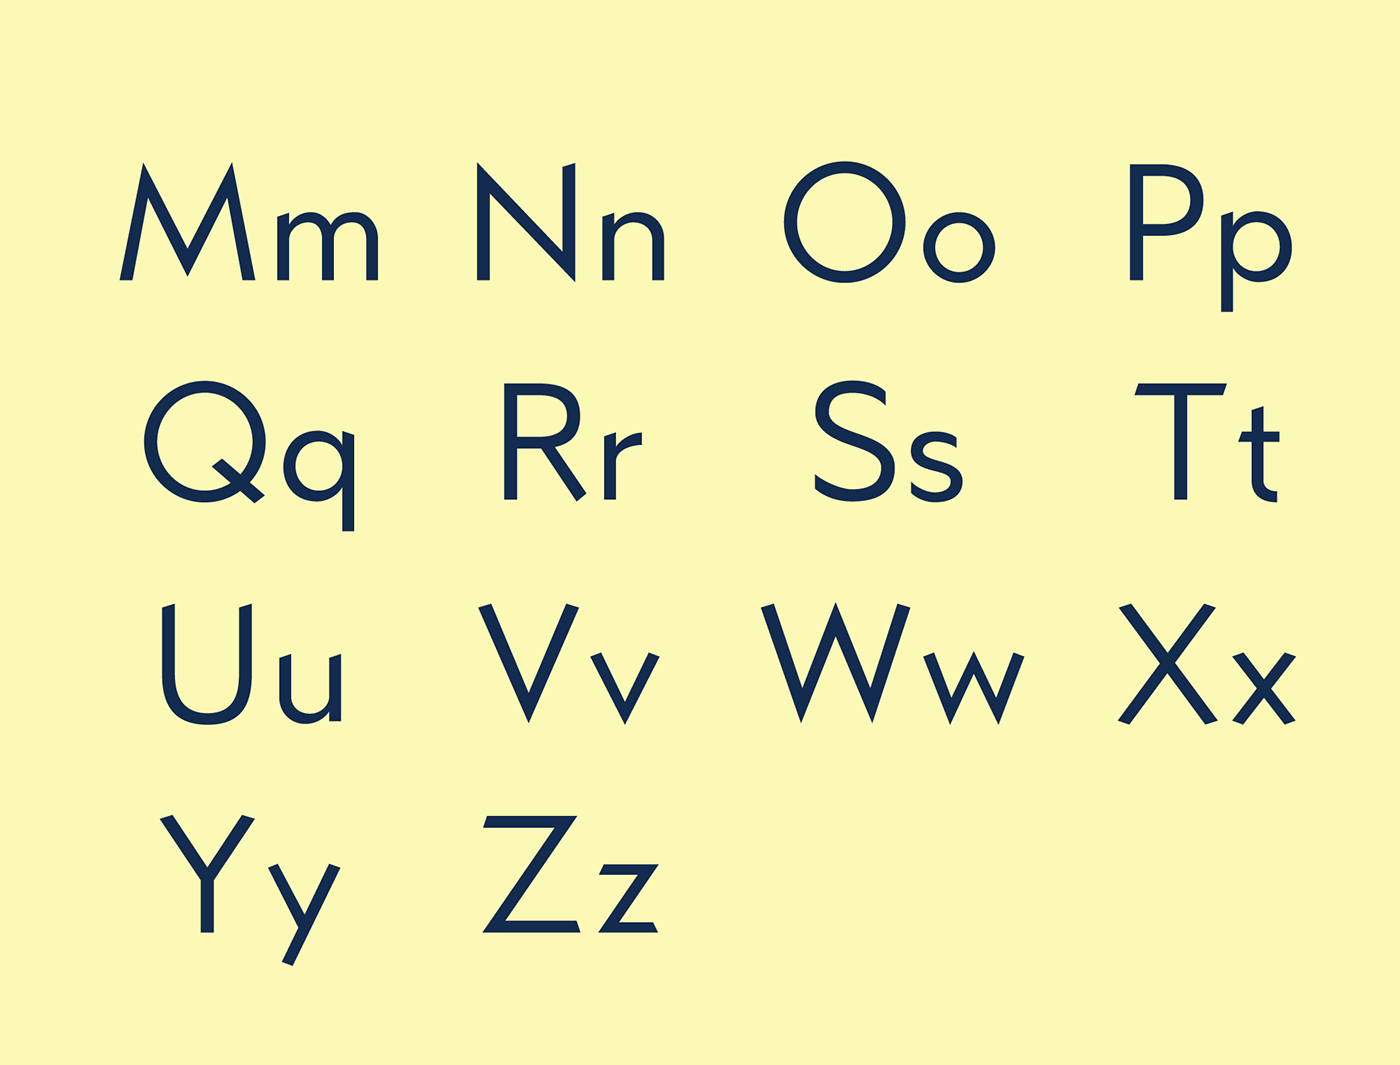 Typeface,geometric,Unique,Geometric Typeface,edge,kano,font,Free font,free typeface,free,Unique Typeface,san serif,Download free font,font design